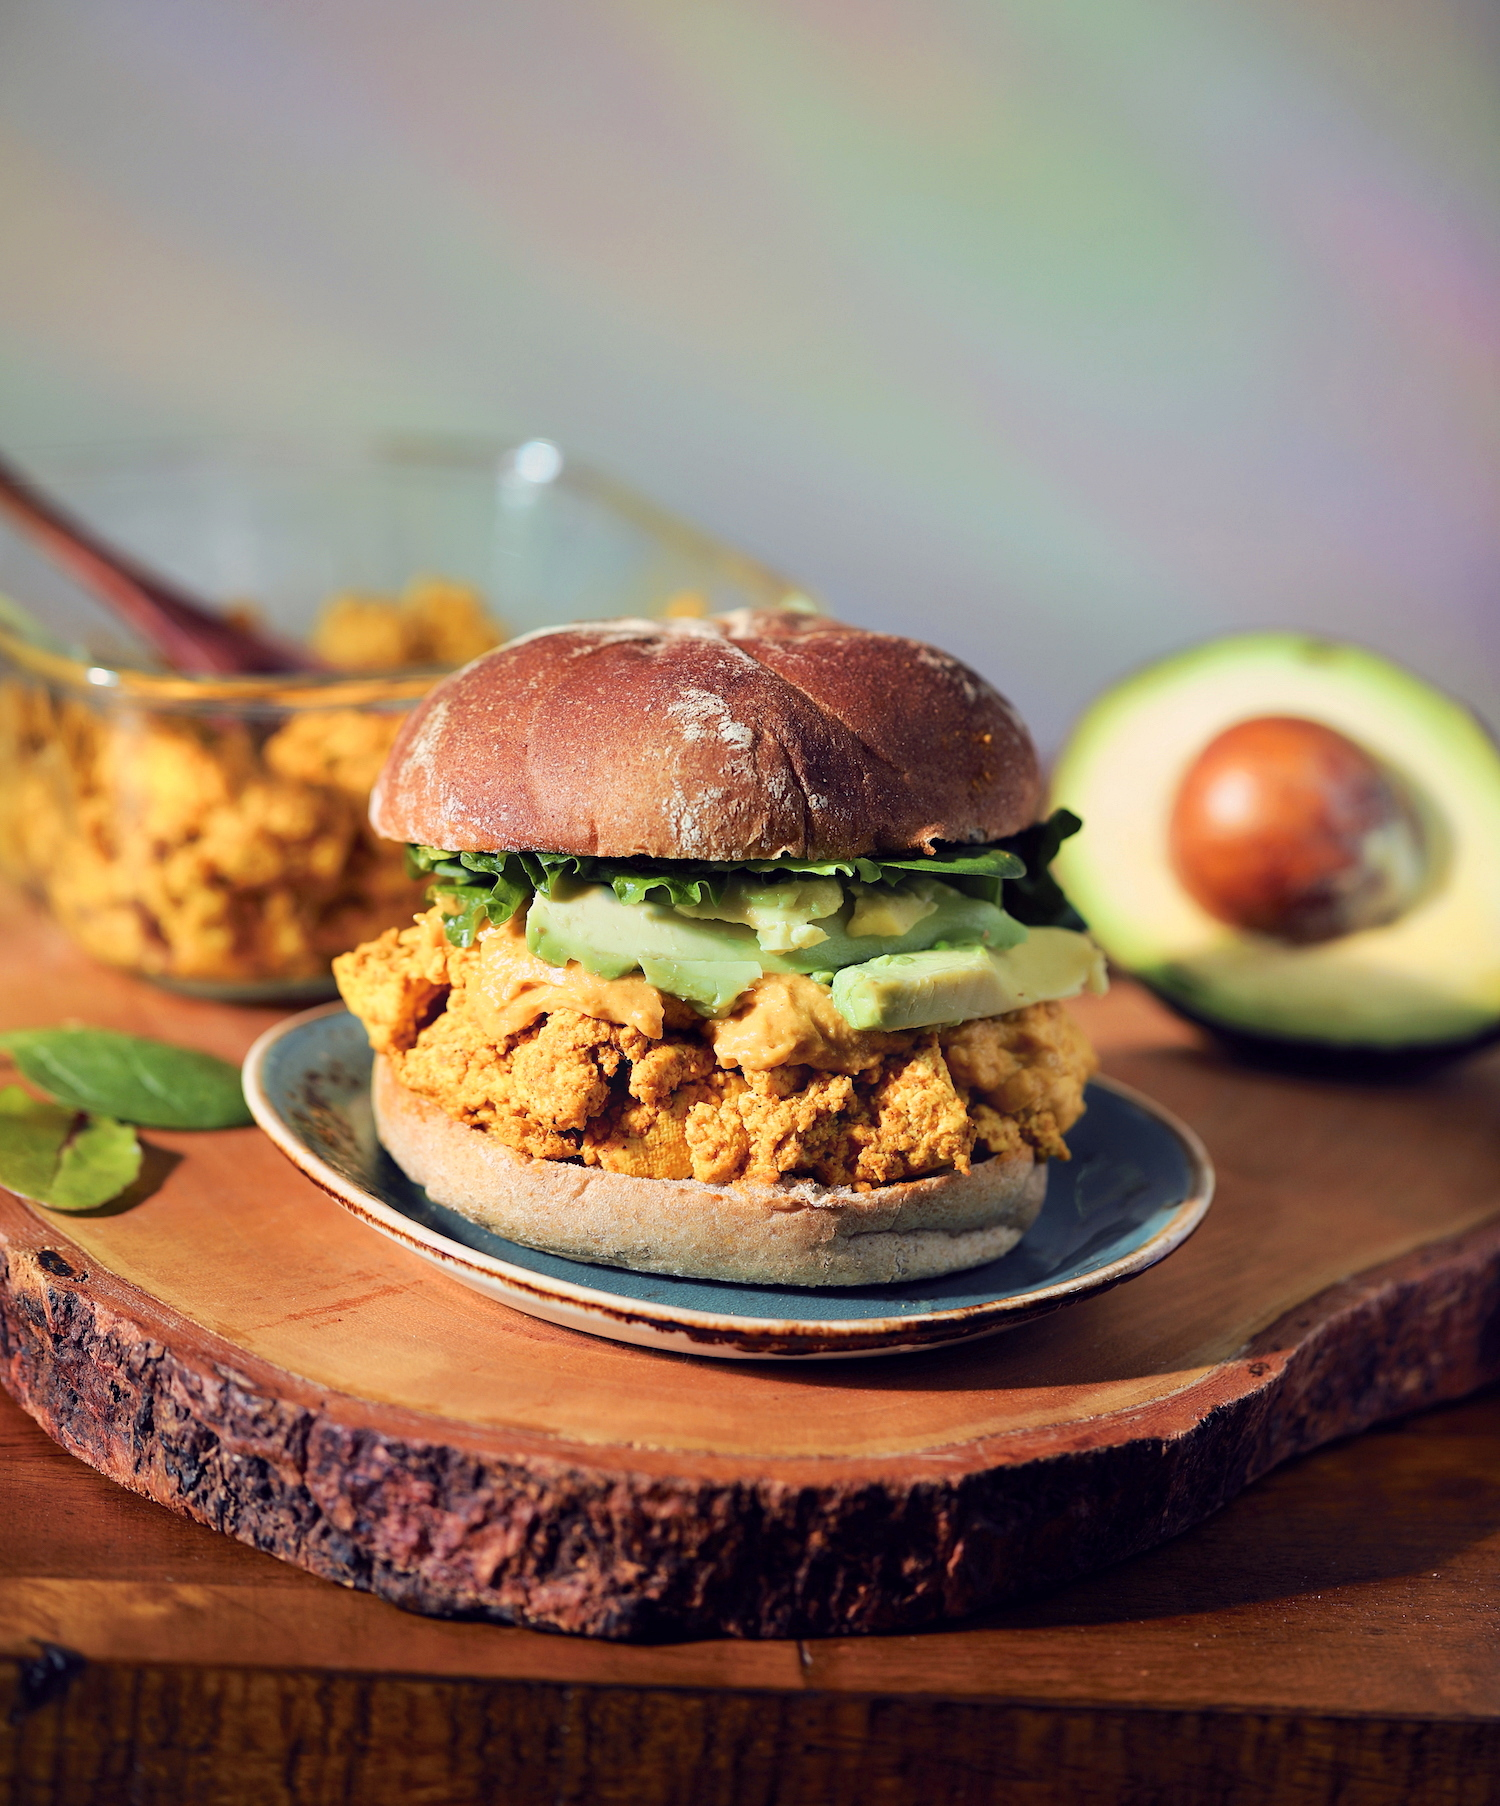 sandwich1 (2).jpg